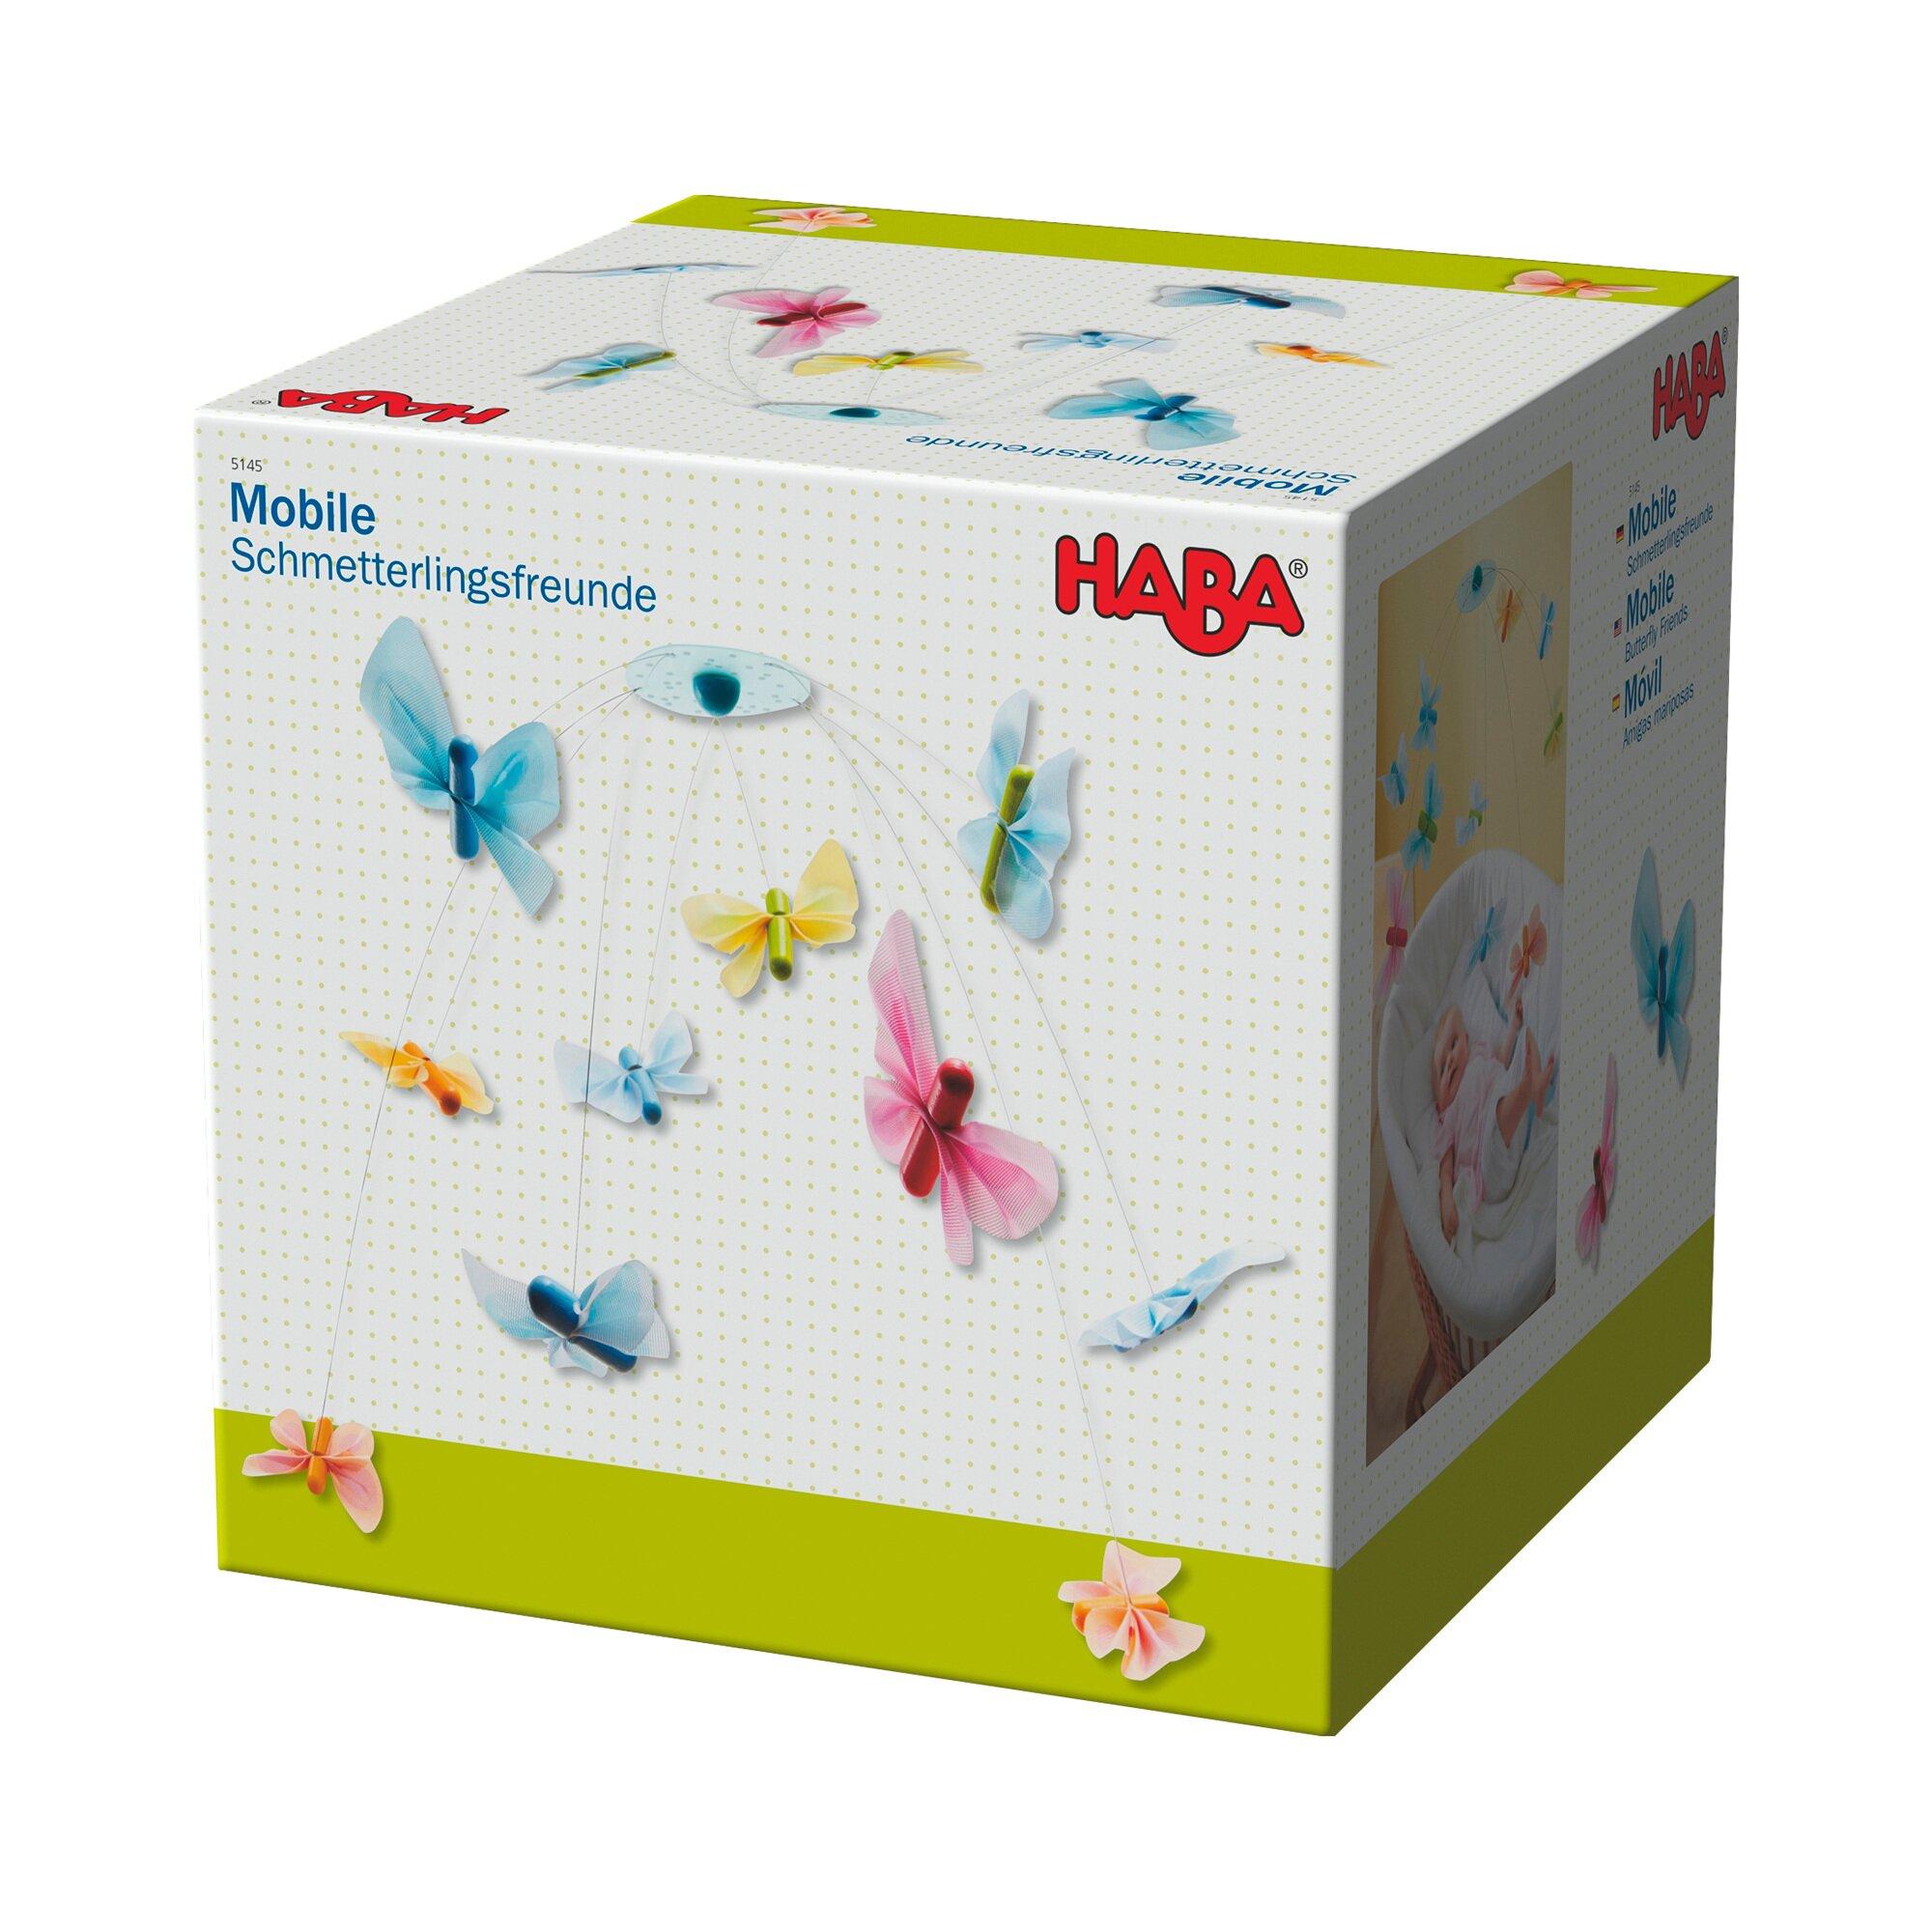 haba-mobile-schmetterlingsfreunde